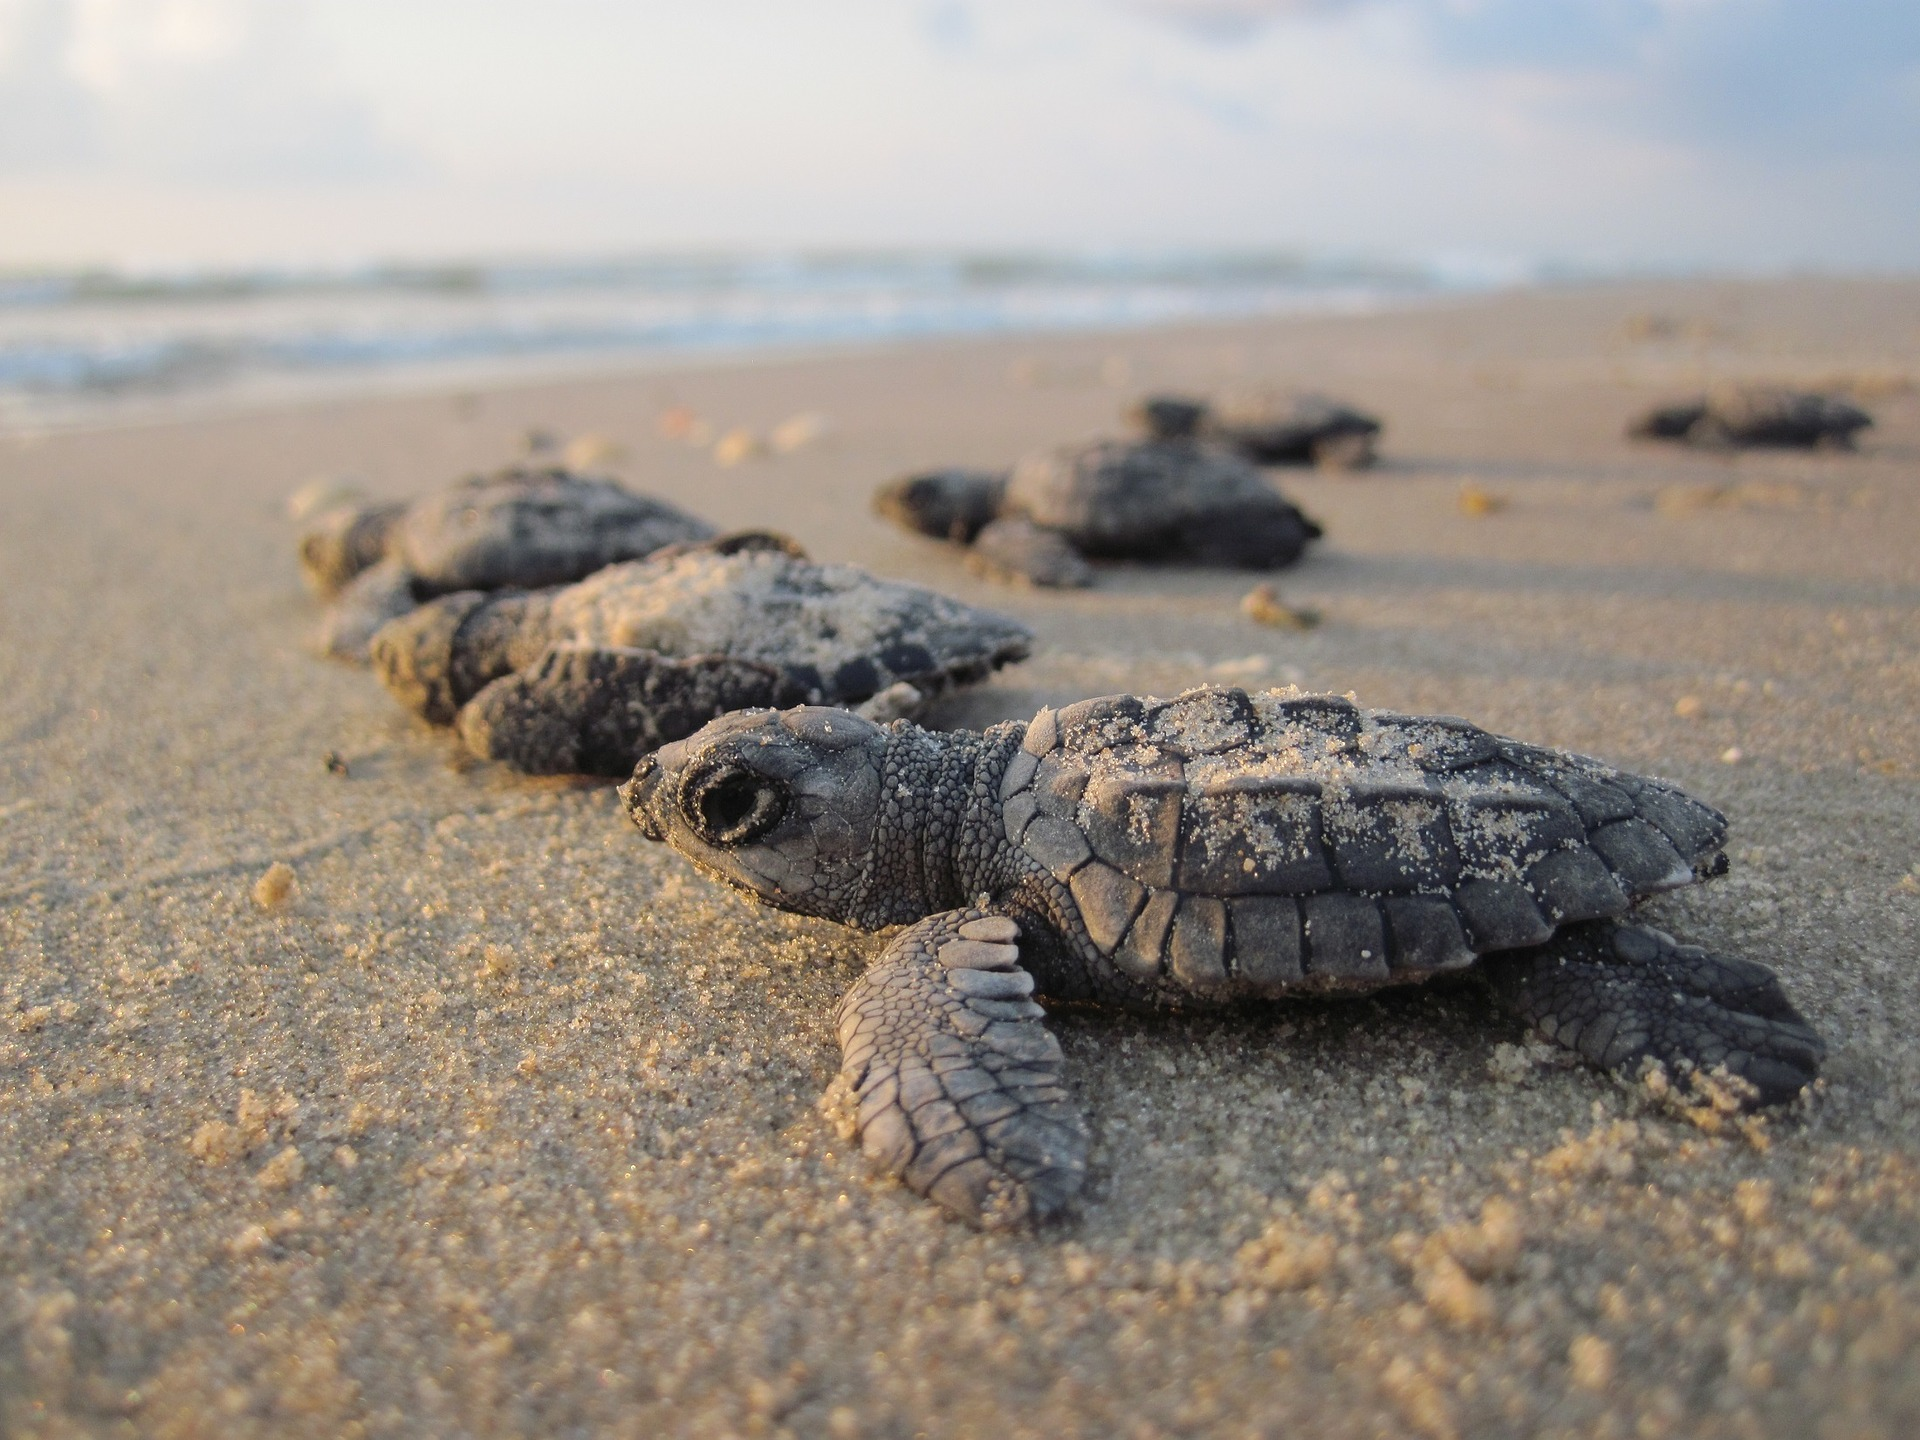 Baby Sea Turtles on the beach headed to ocean